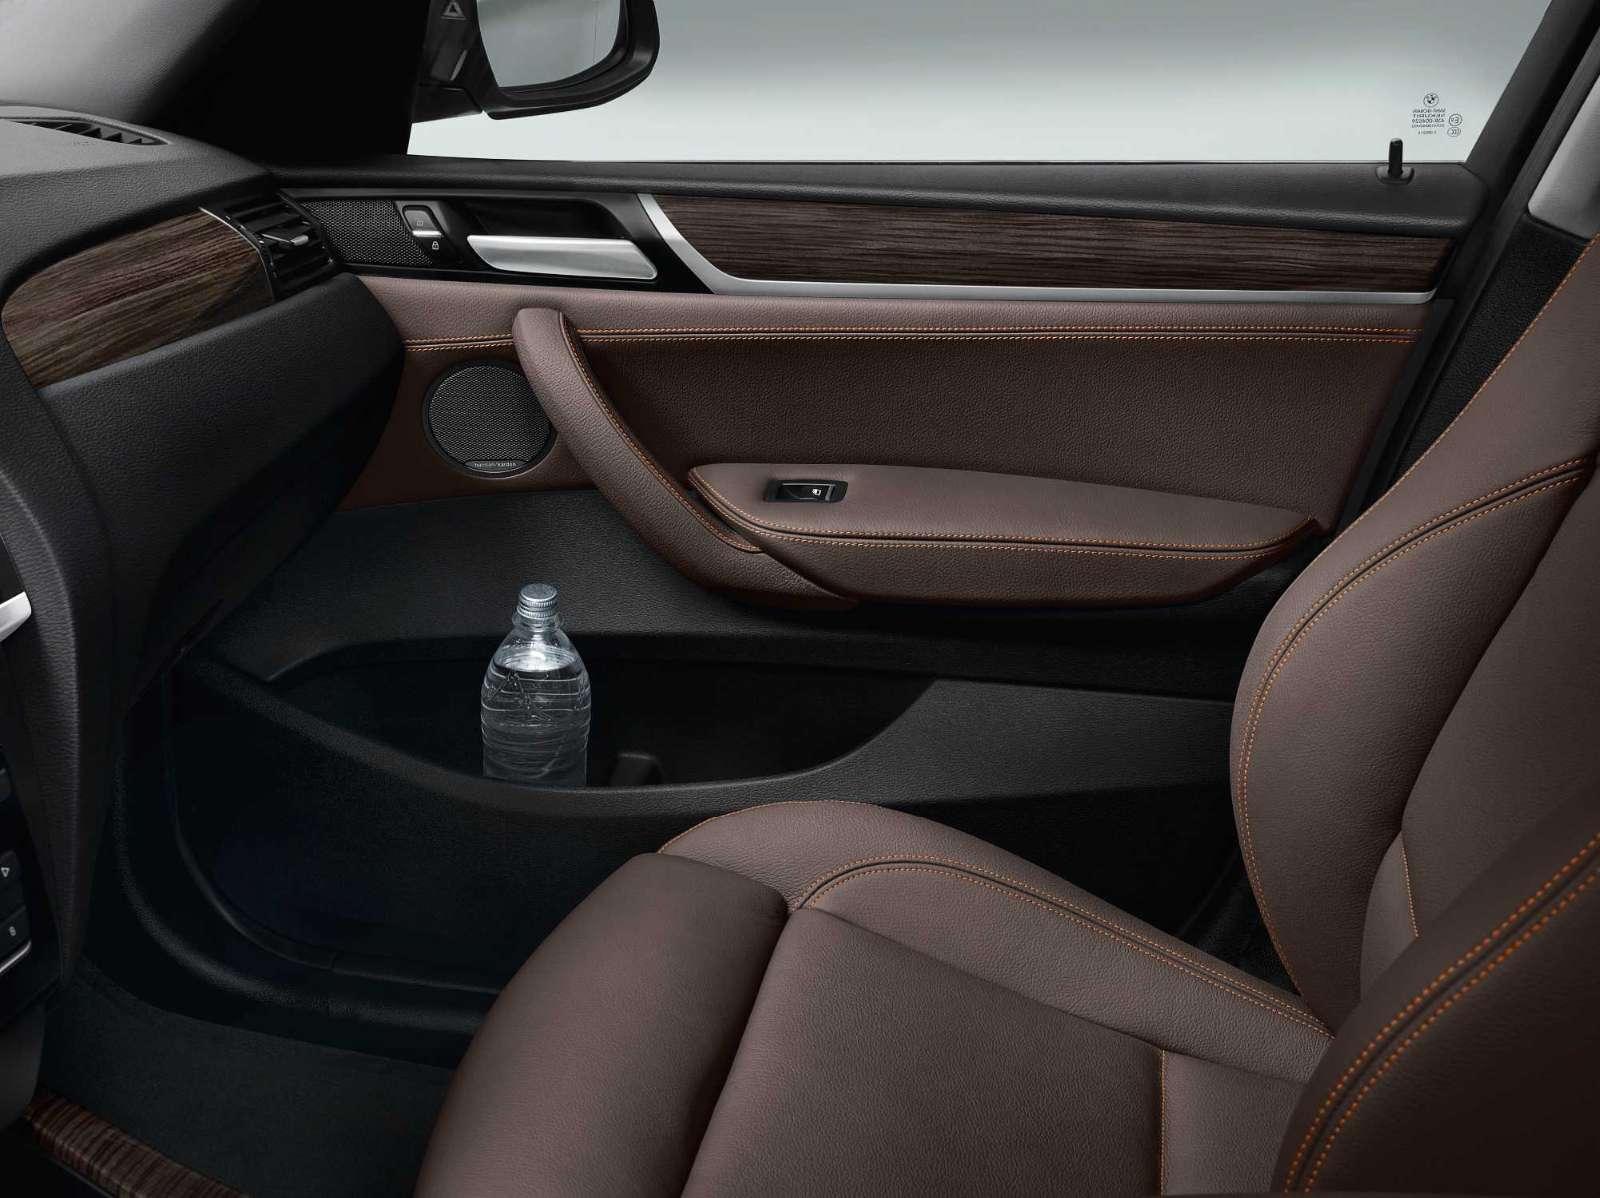 BMW X3 2015 Facelift interior